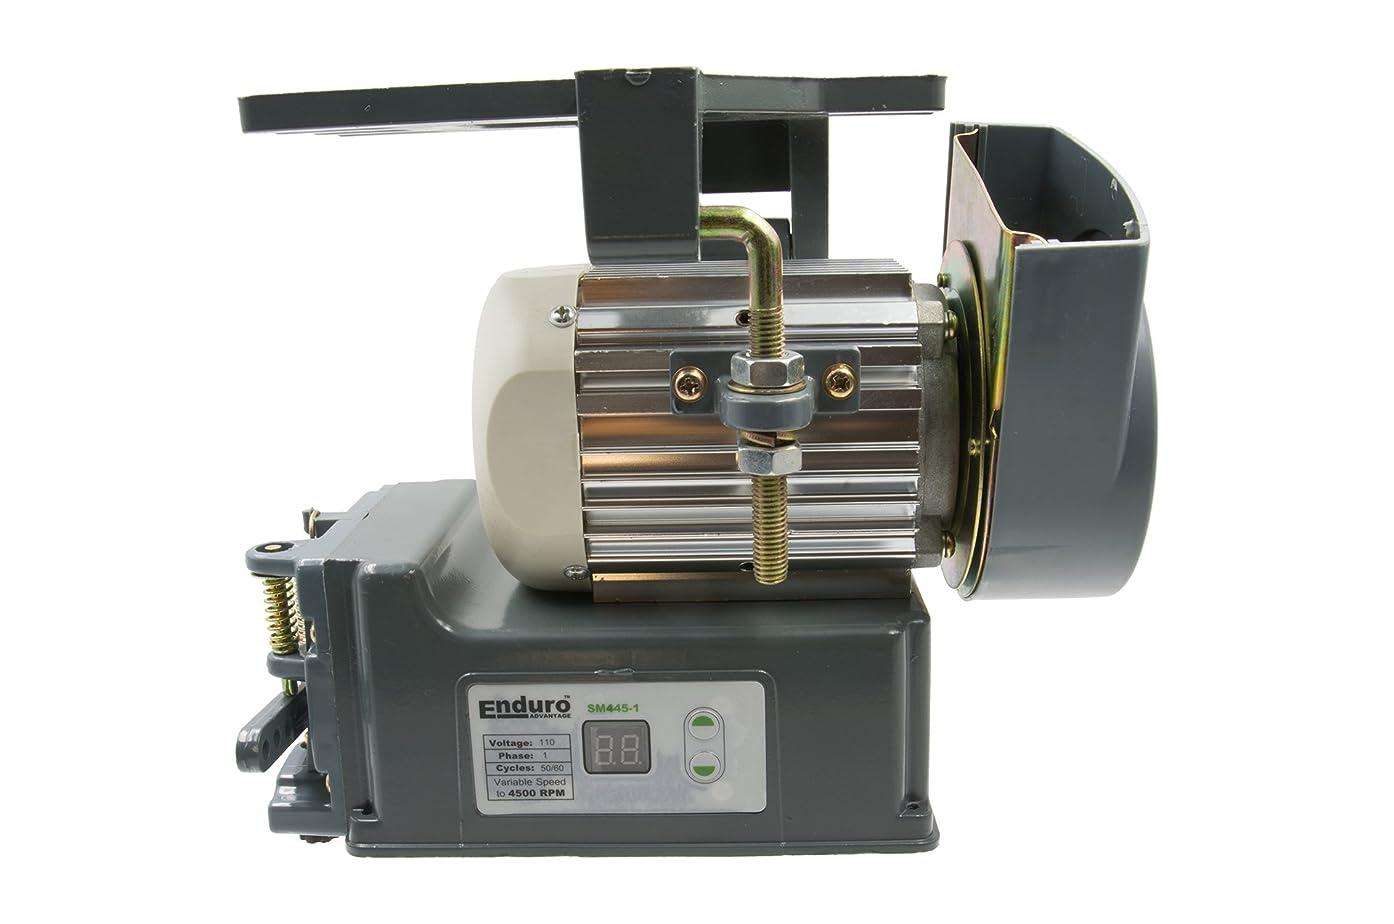 Sewing Machine Motor - Enduro Advantage 110-Volt Single Phase Servo Sewing Machine Motor